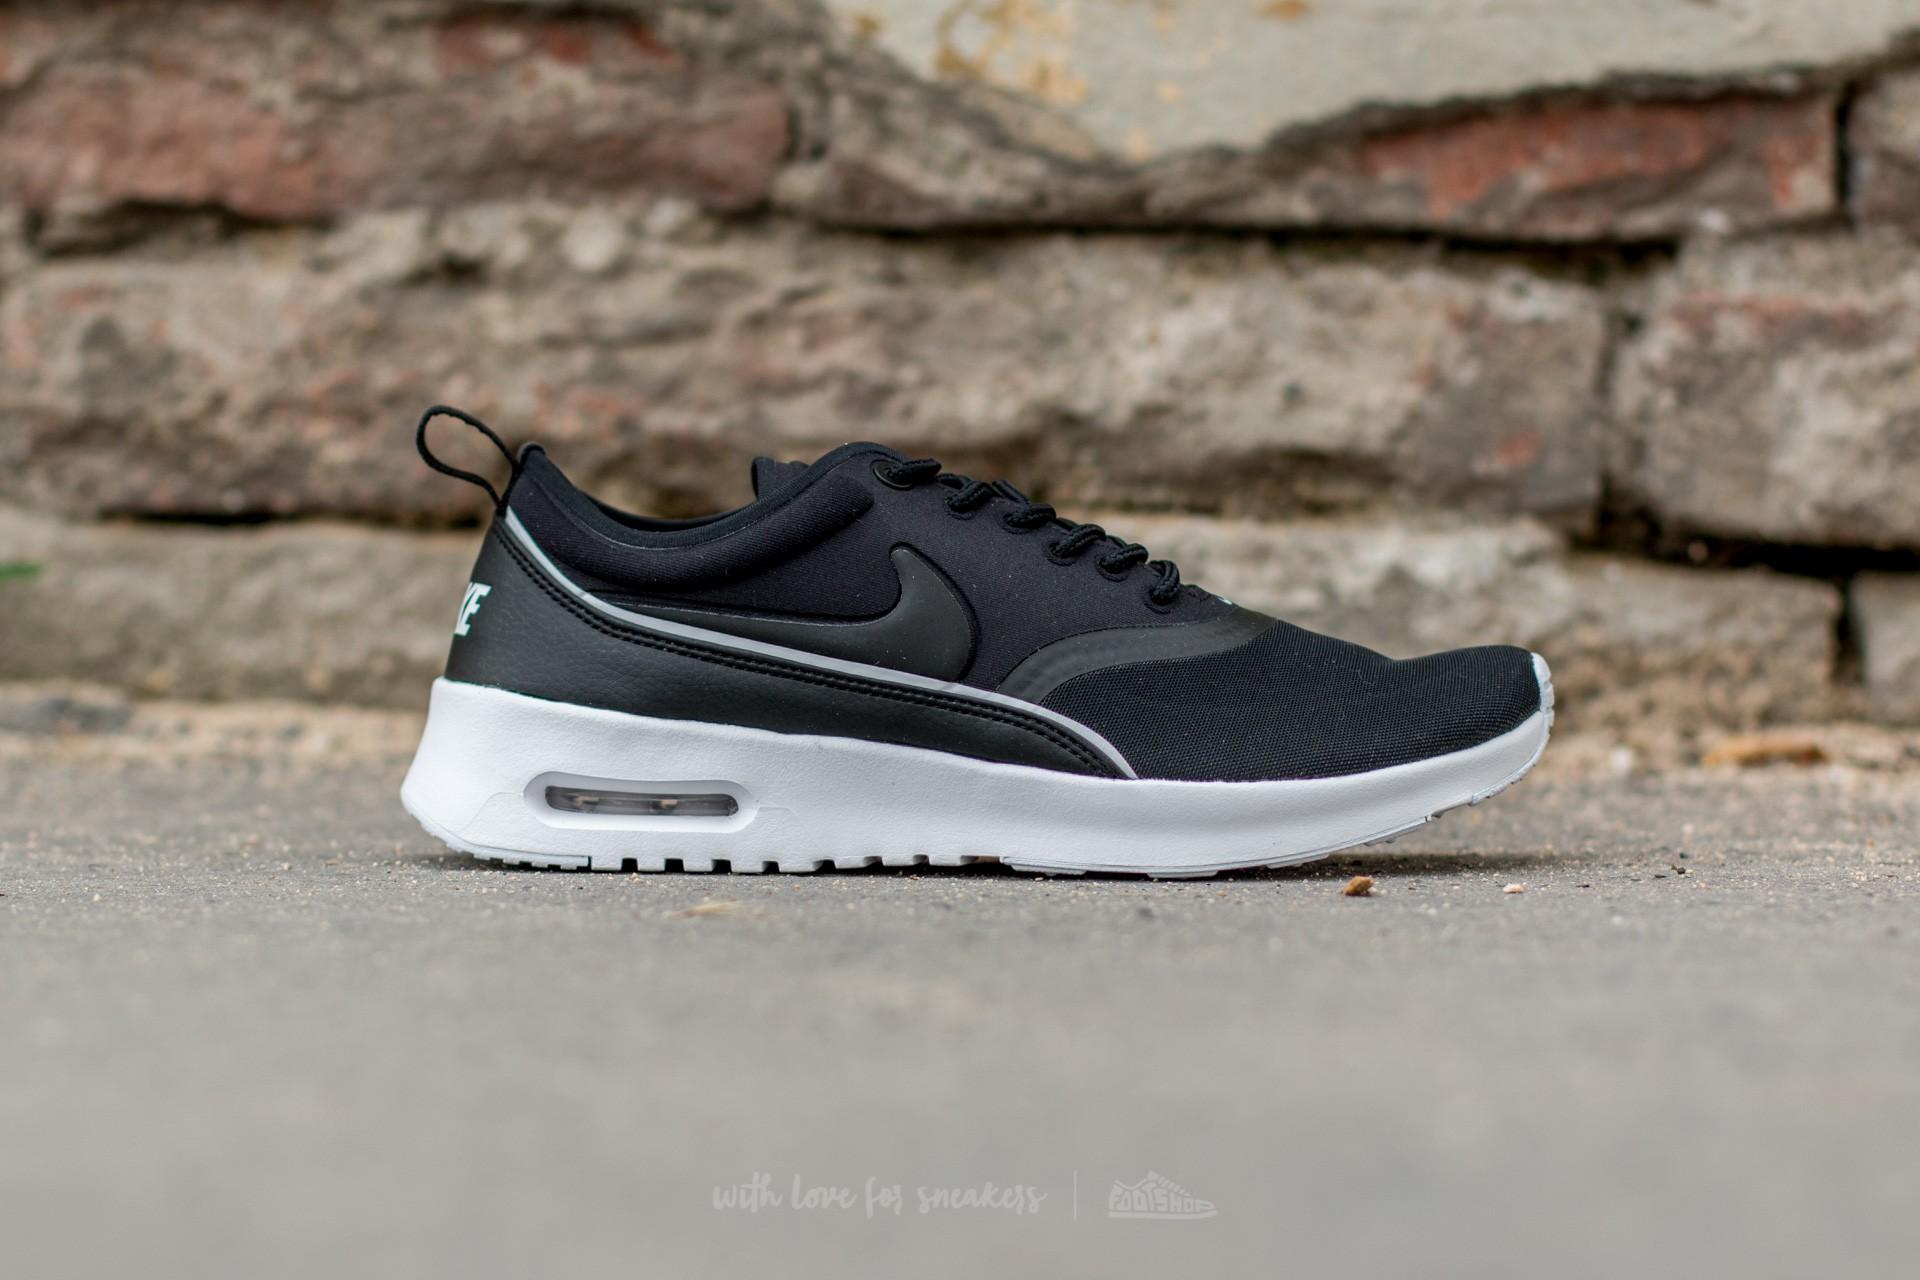 Nike AIR MAX THEA ULTRA BlackBlack